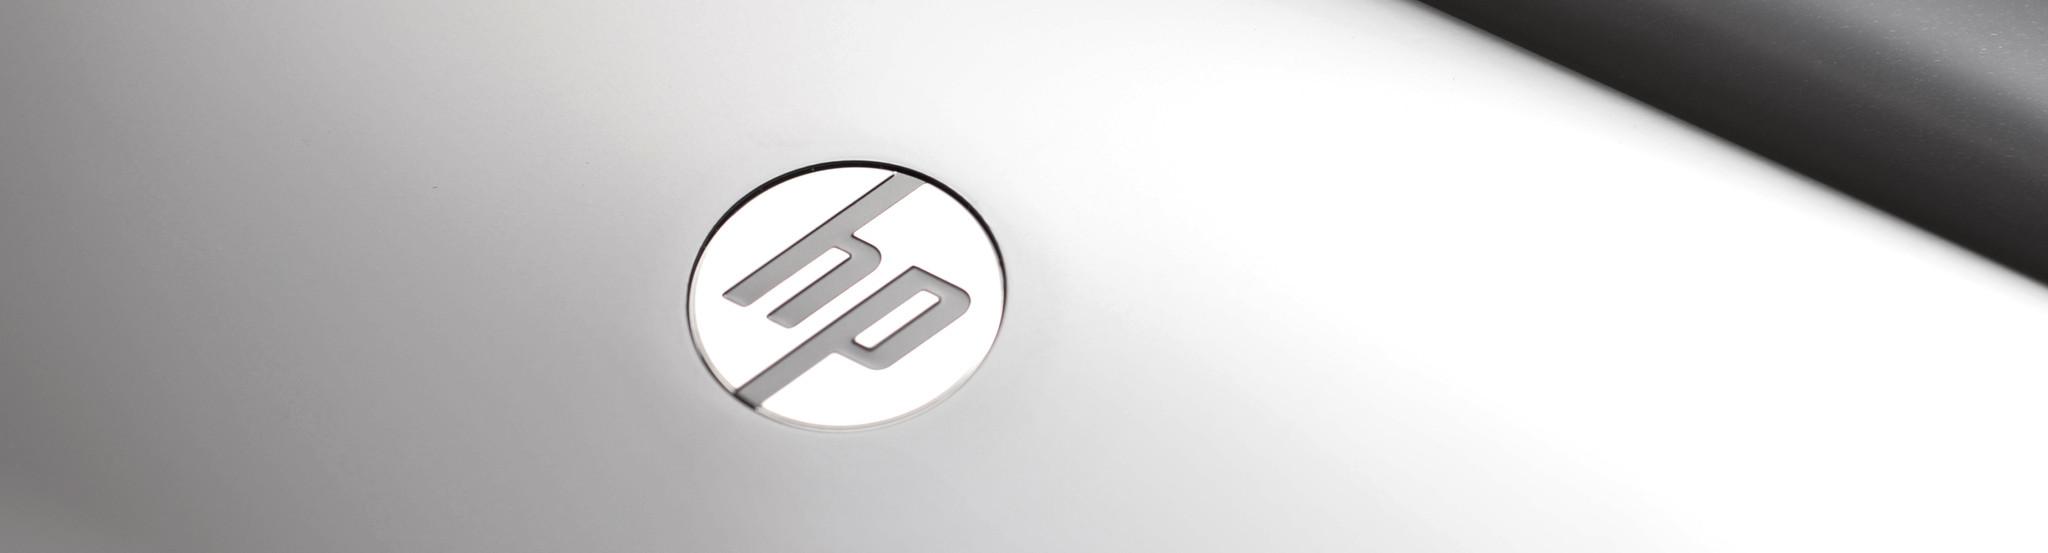 HP logo on device